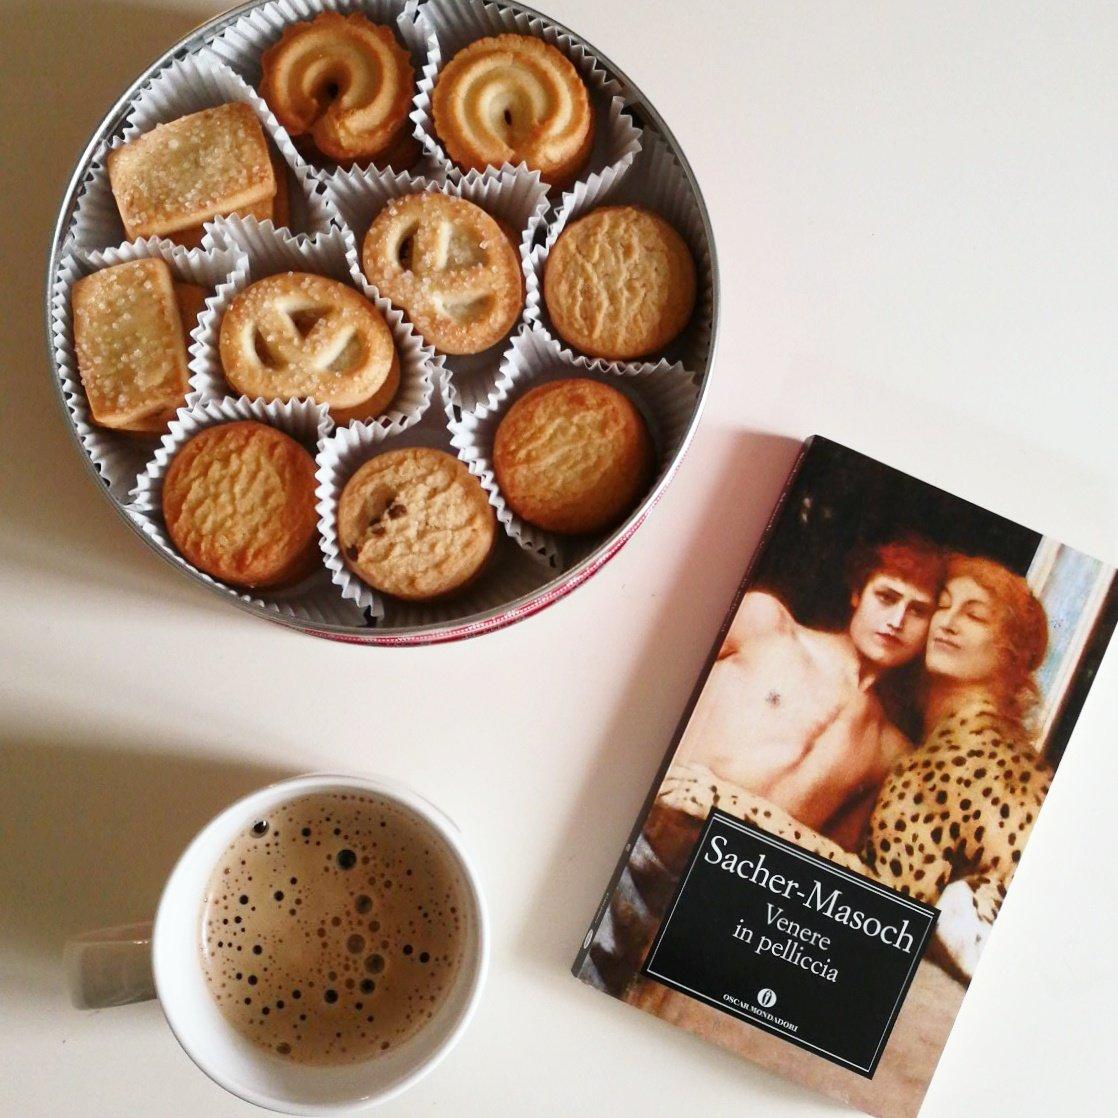 ° Breakfast, book, Sunday °  #home #weekend  @CasaLettori @petuniaollister<br>http://pic.twitter.com/kFv1RWJvOl